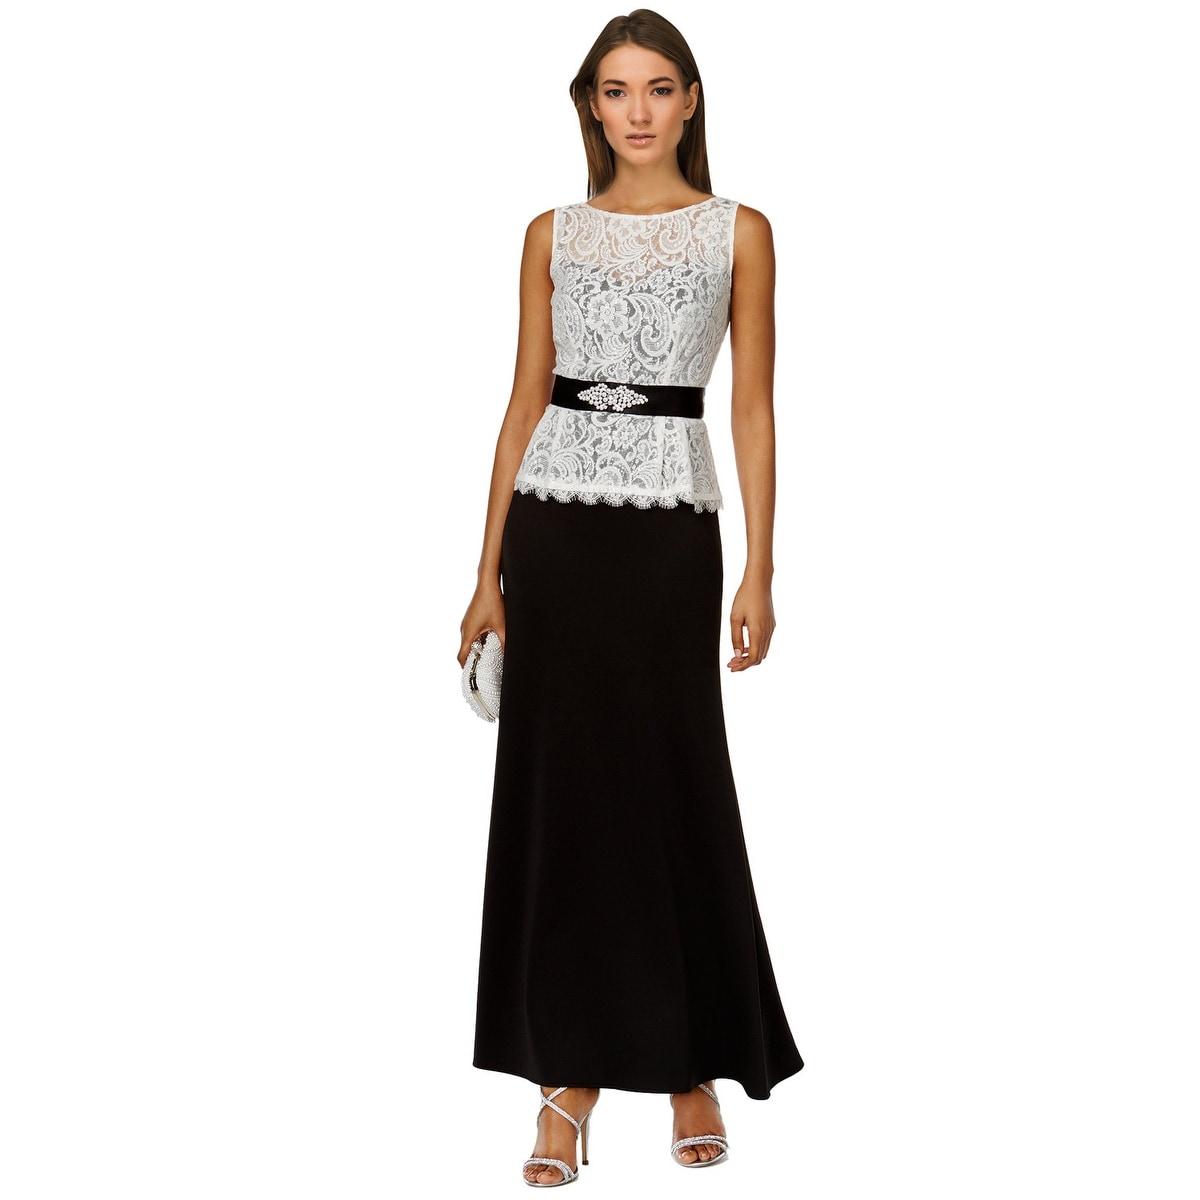 Shop SLNY SL Fashions Contrast Lace Peplum Evening Gown Dress - 4 ...